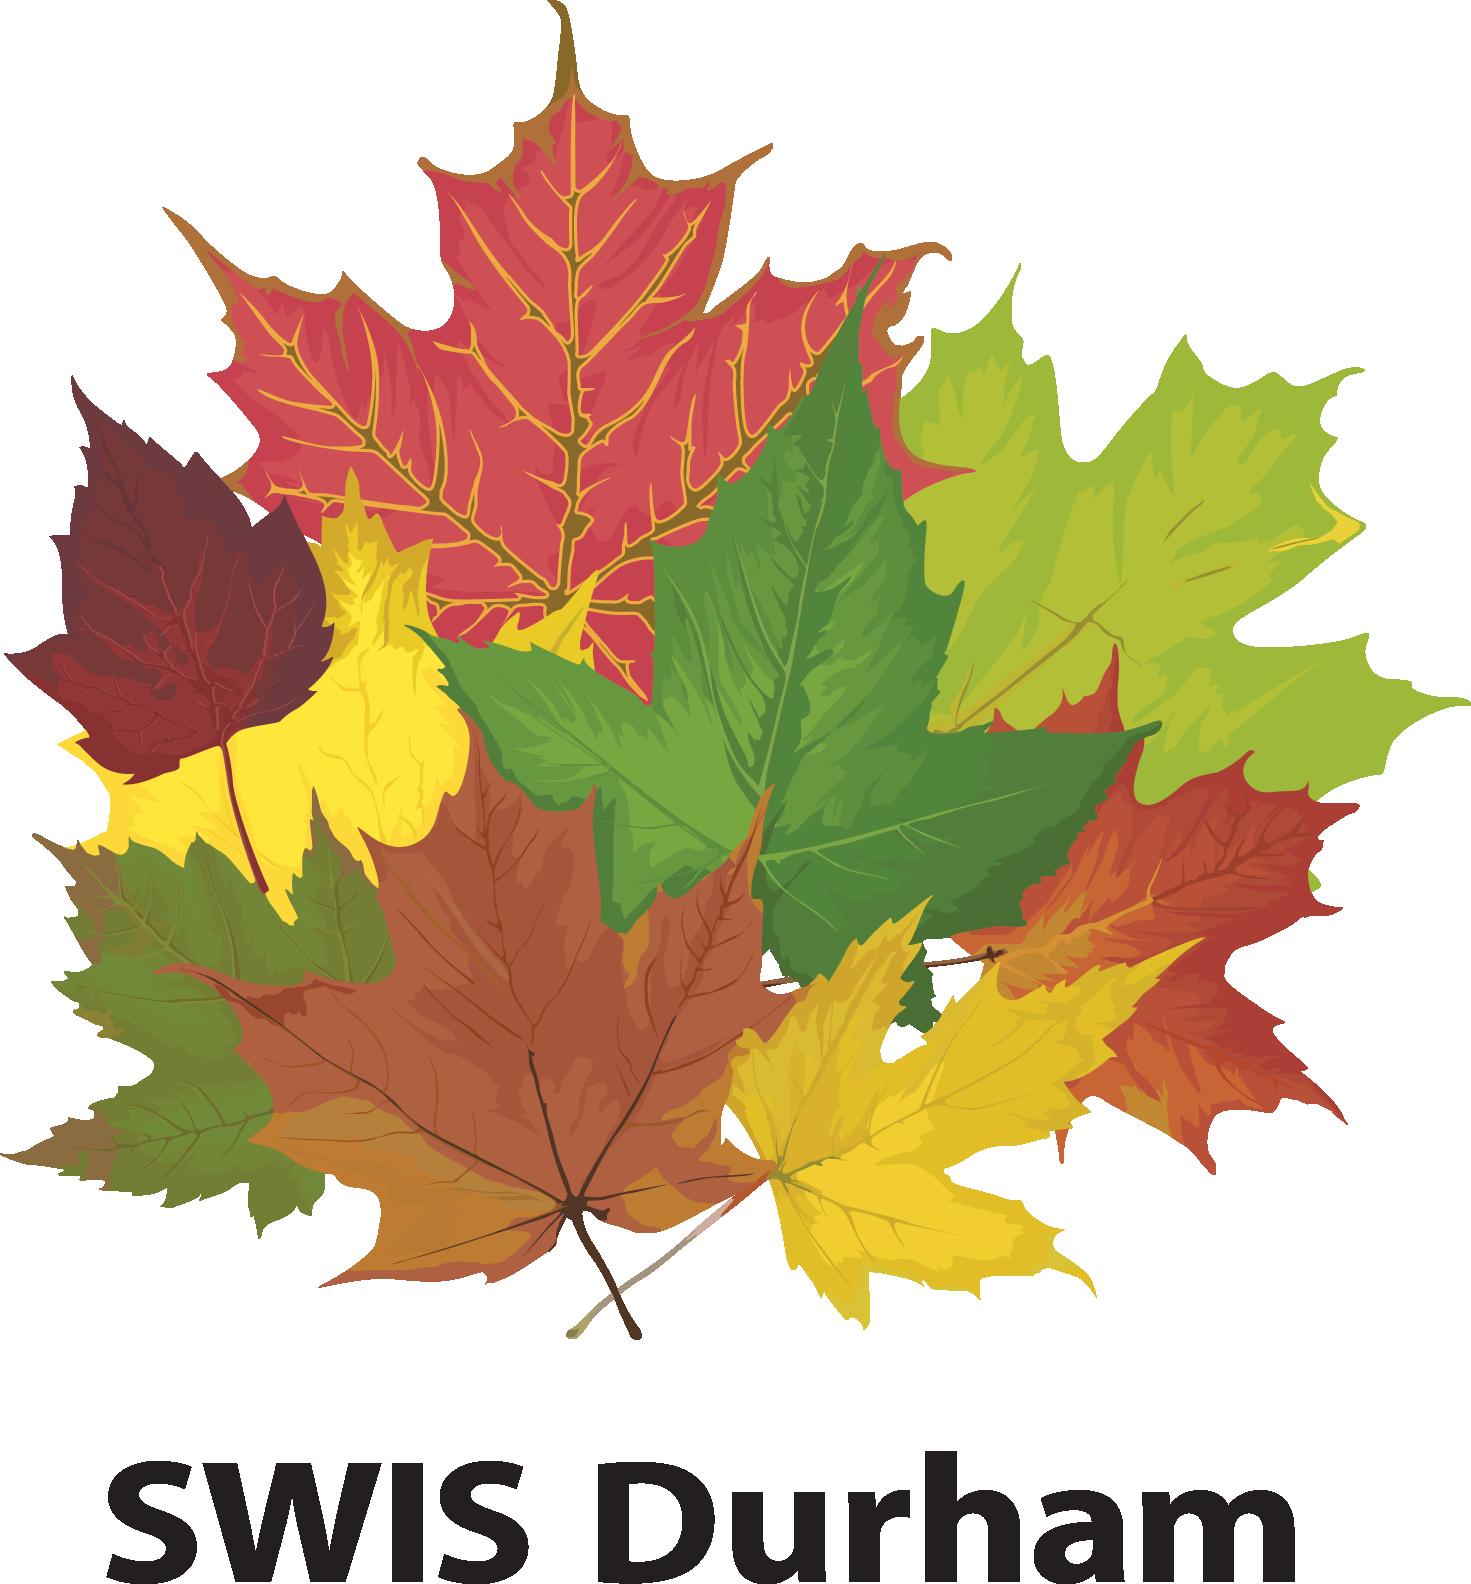 SWIS Durham